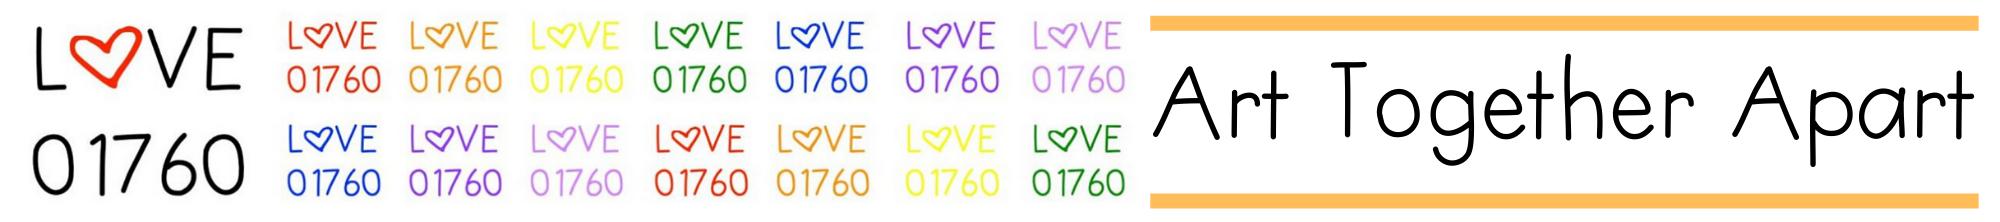 Love01760